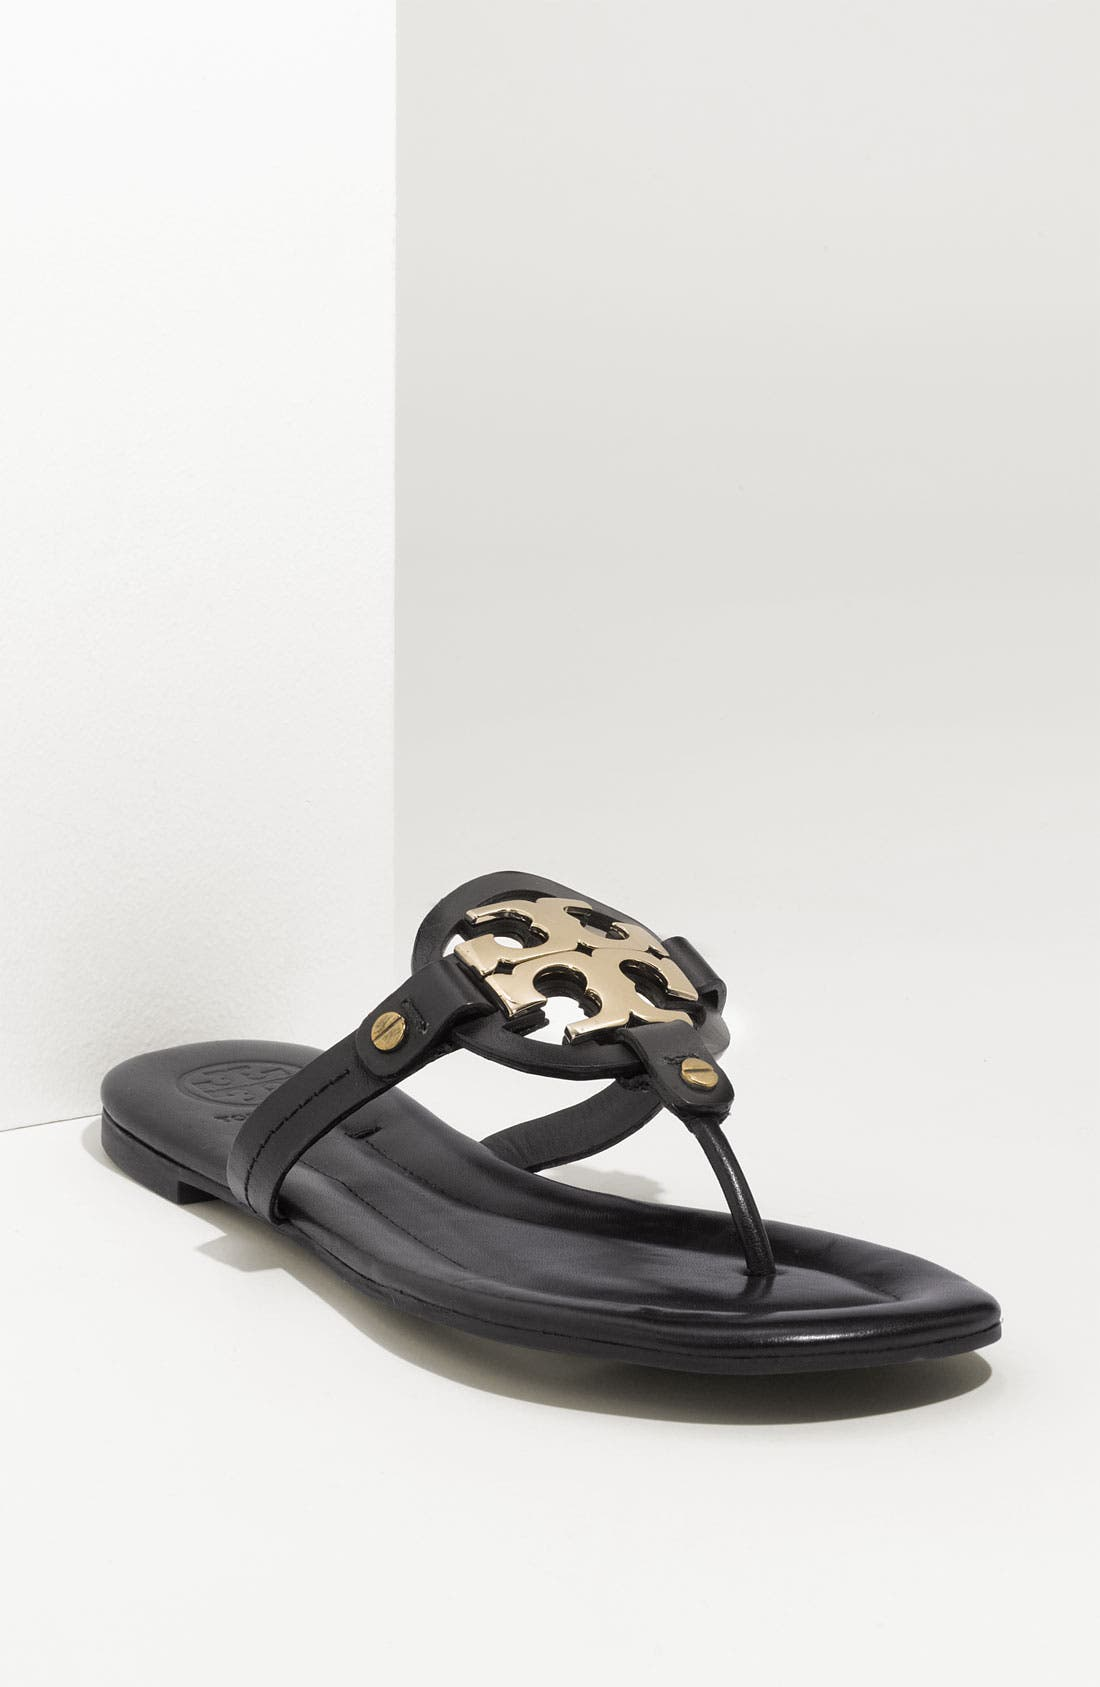 TORY BURCH 'Miller 2' Logo Sandal, Main, color, 001